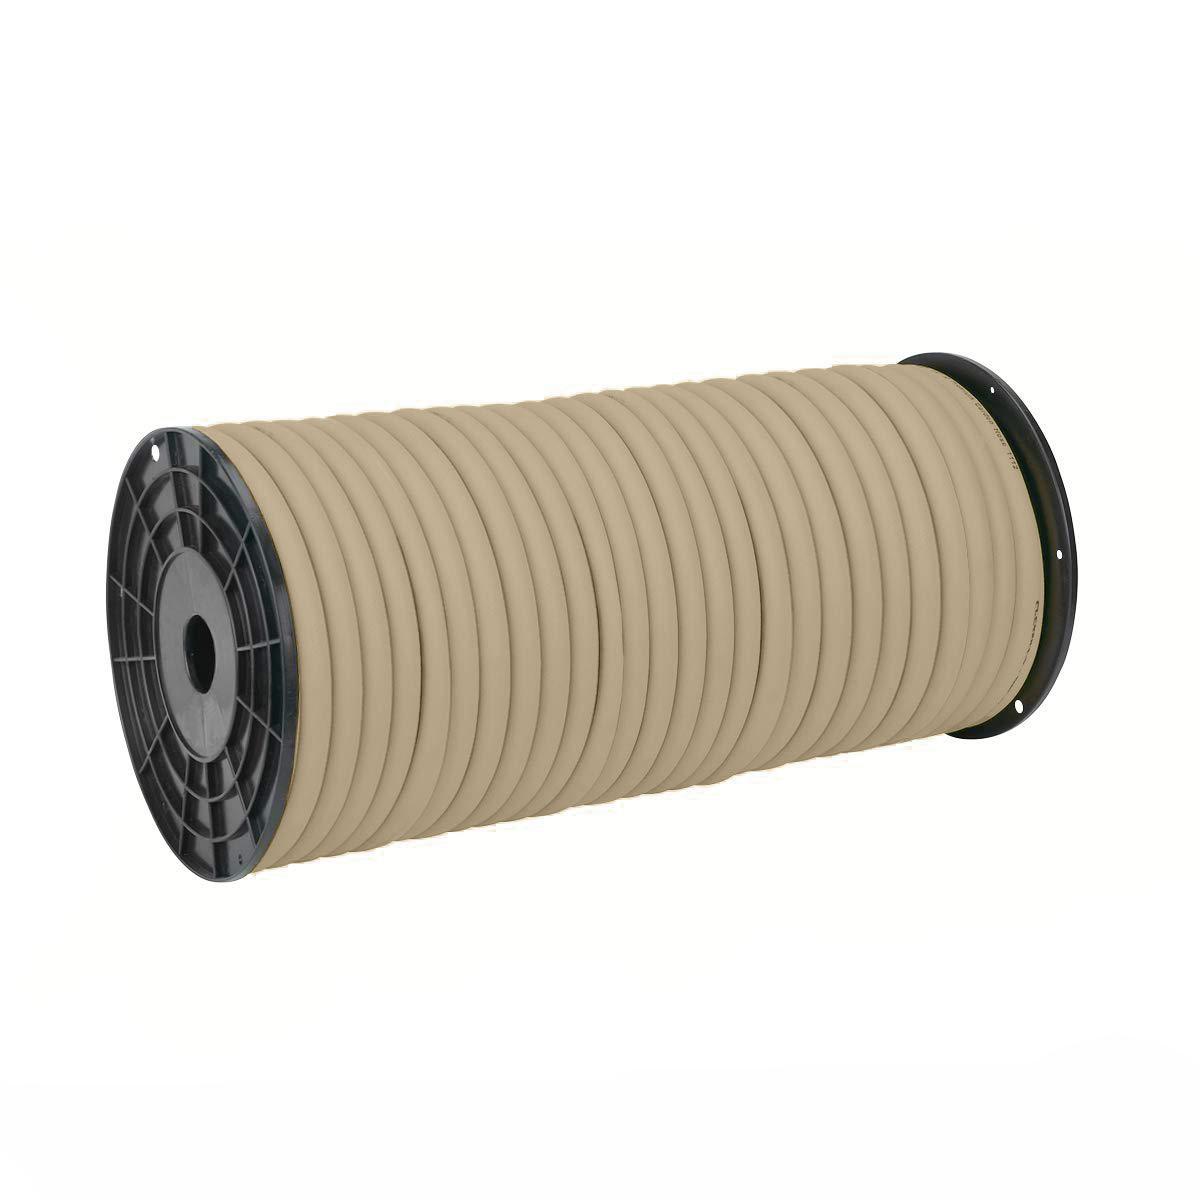 Flexzilla HFZC58250BRS Pro Water Hose, Plastic Spool 5/8 in x 250 ft Brown Mulch